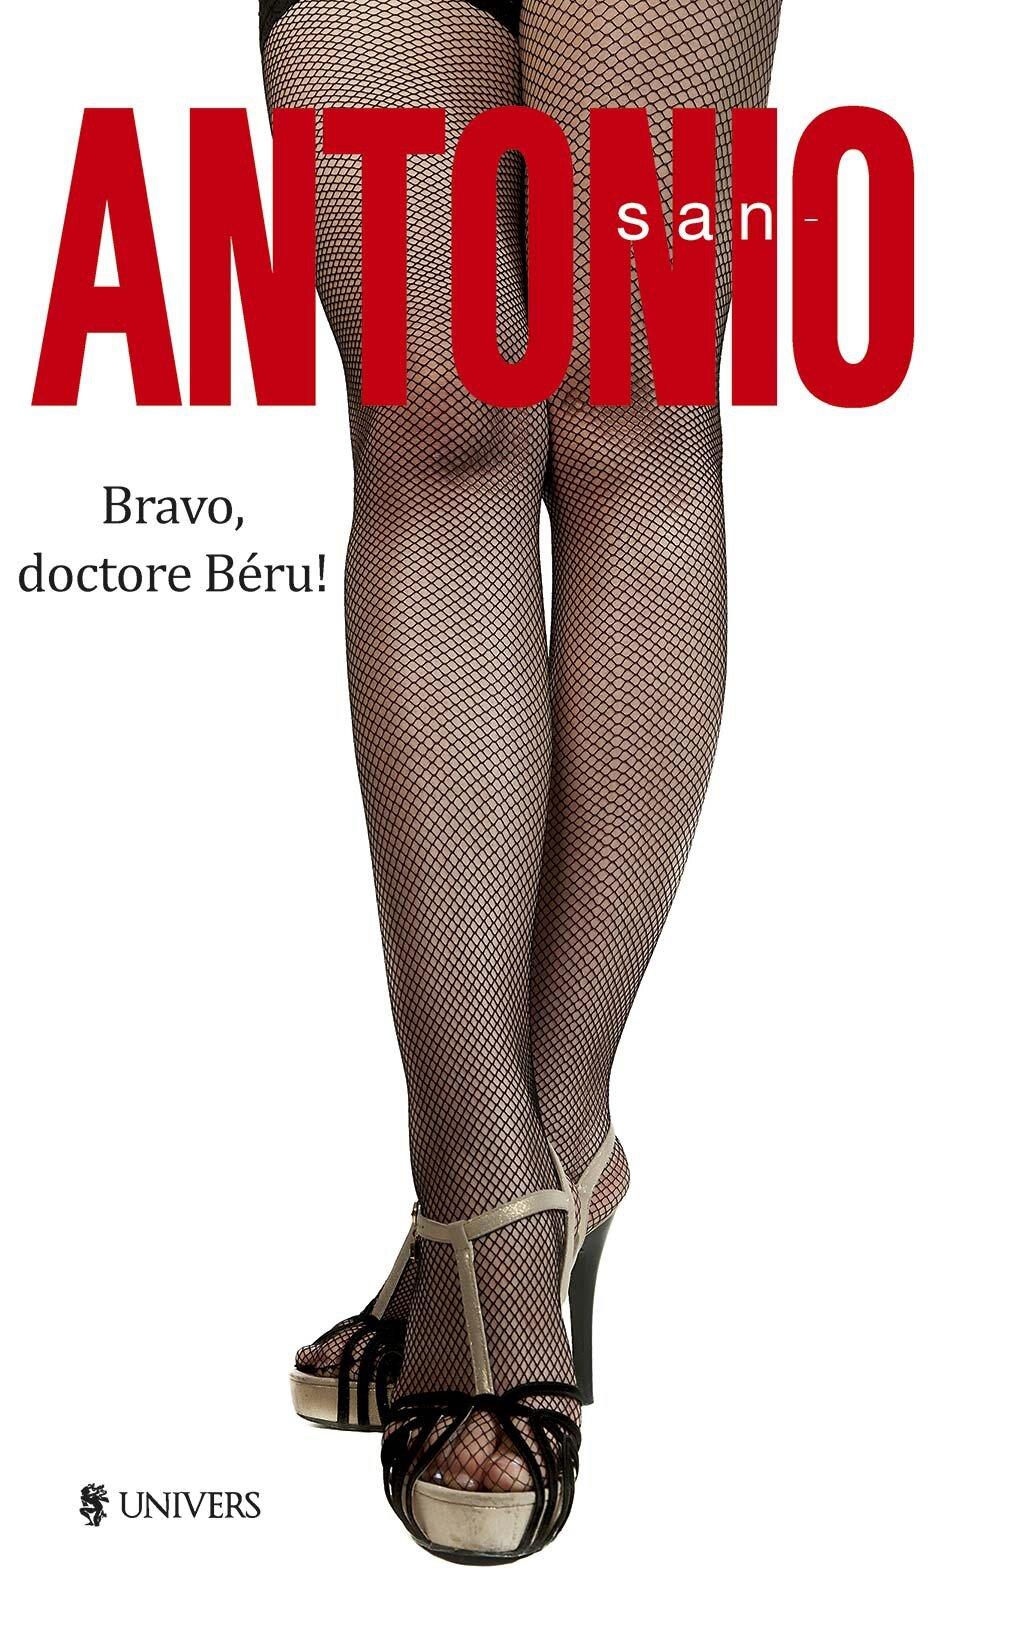 San-Antonio. Bravo, doctore Beru! PDF (Download eBook)